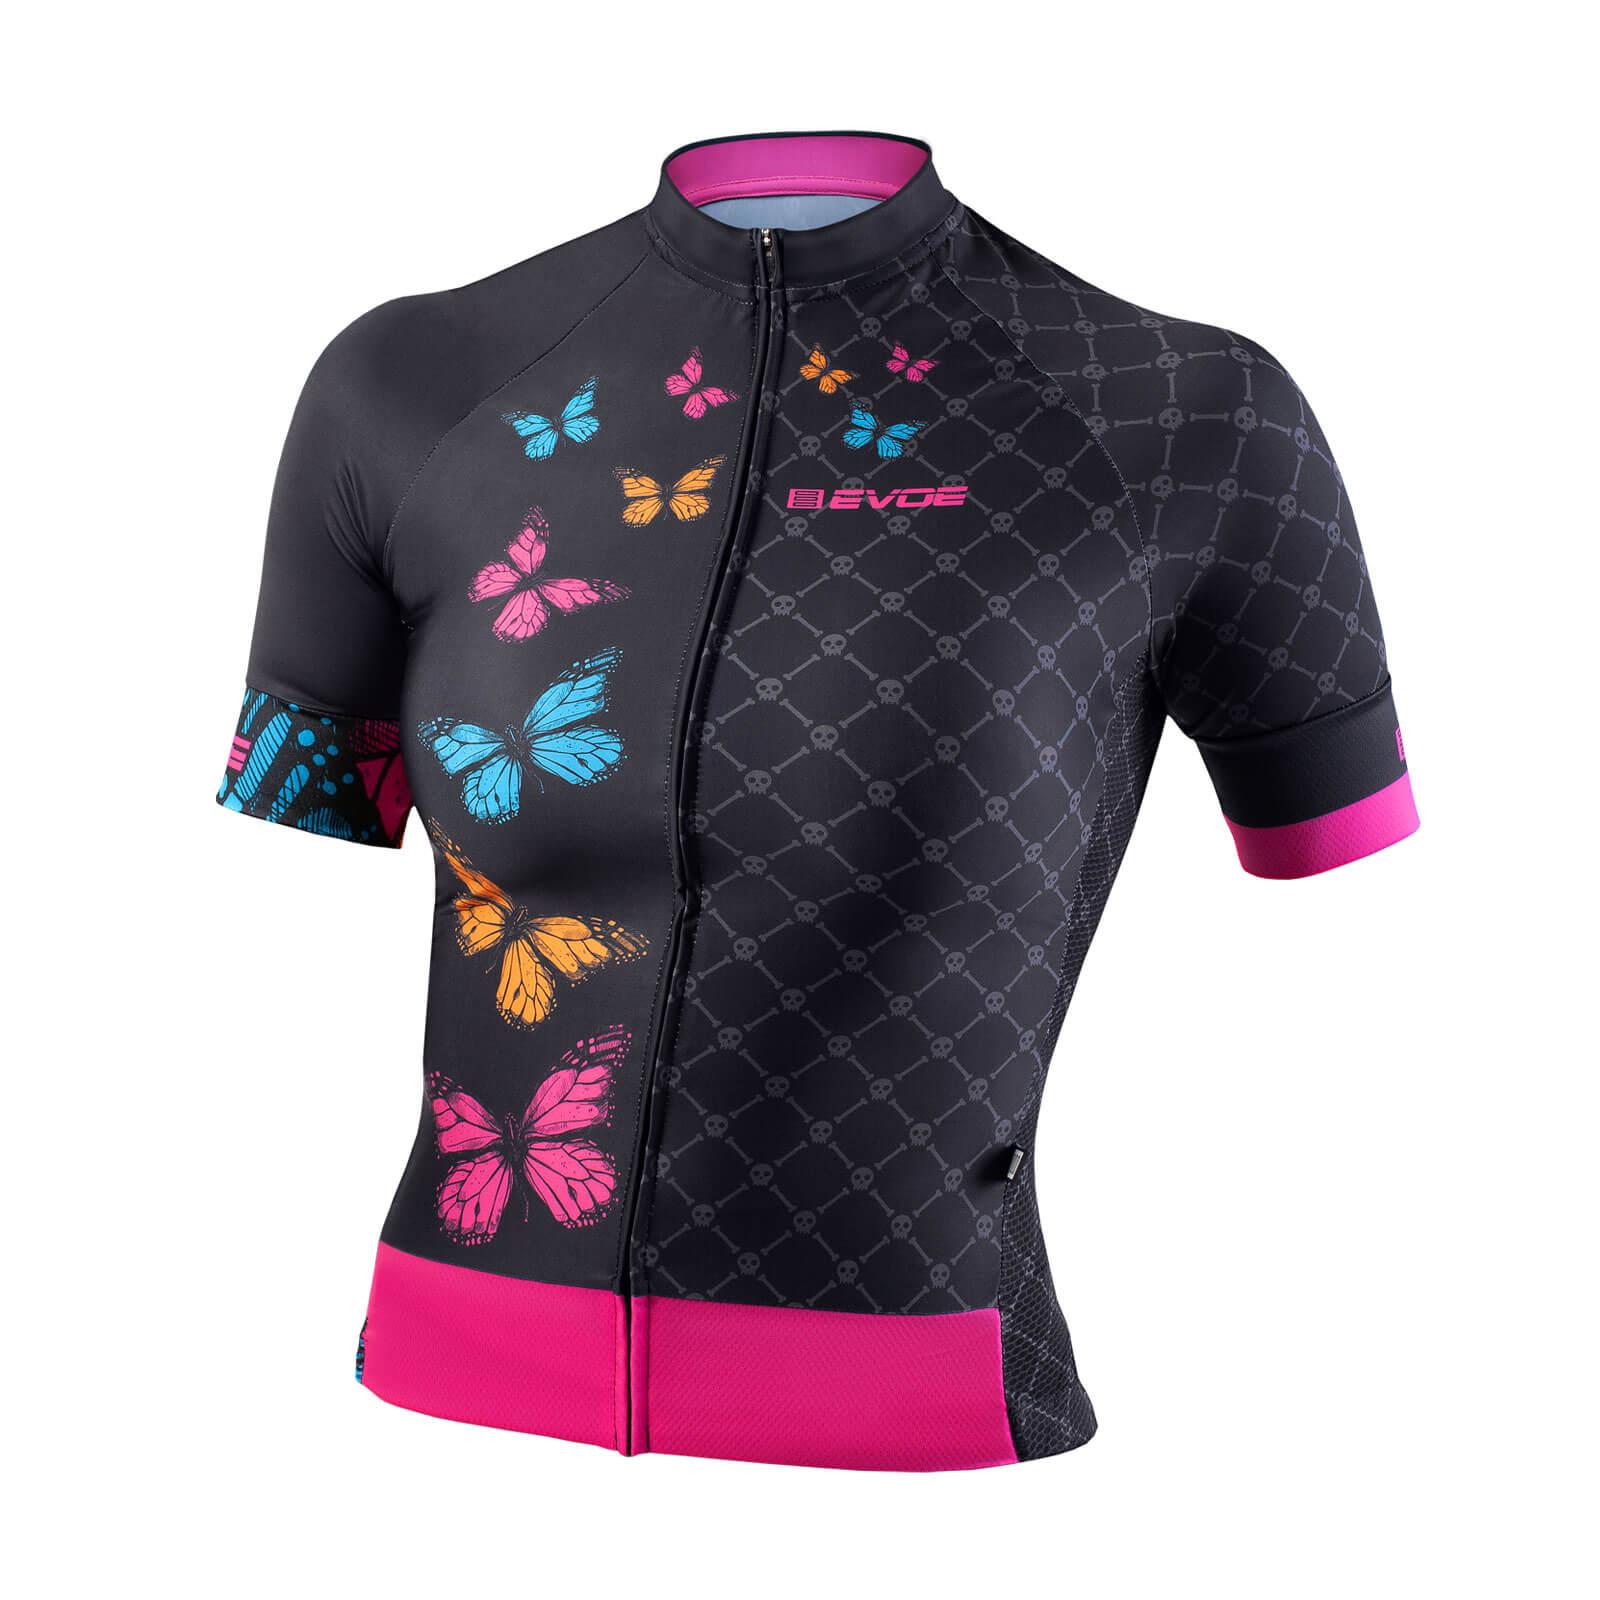 Camisa Ciclismo Evoe Feminina Preto Borboletas Bolso Zipper